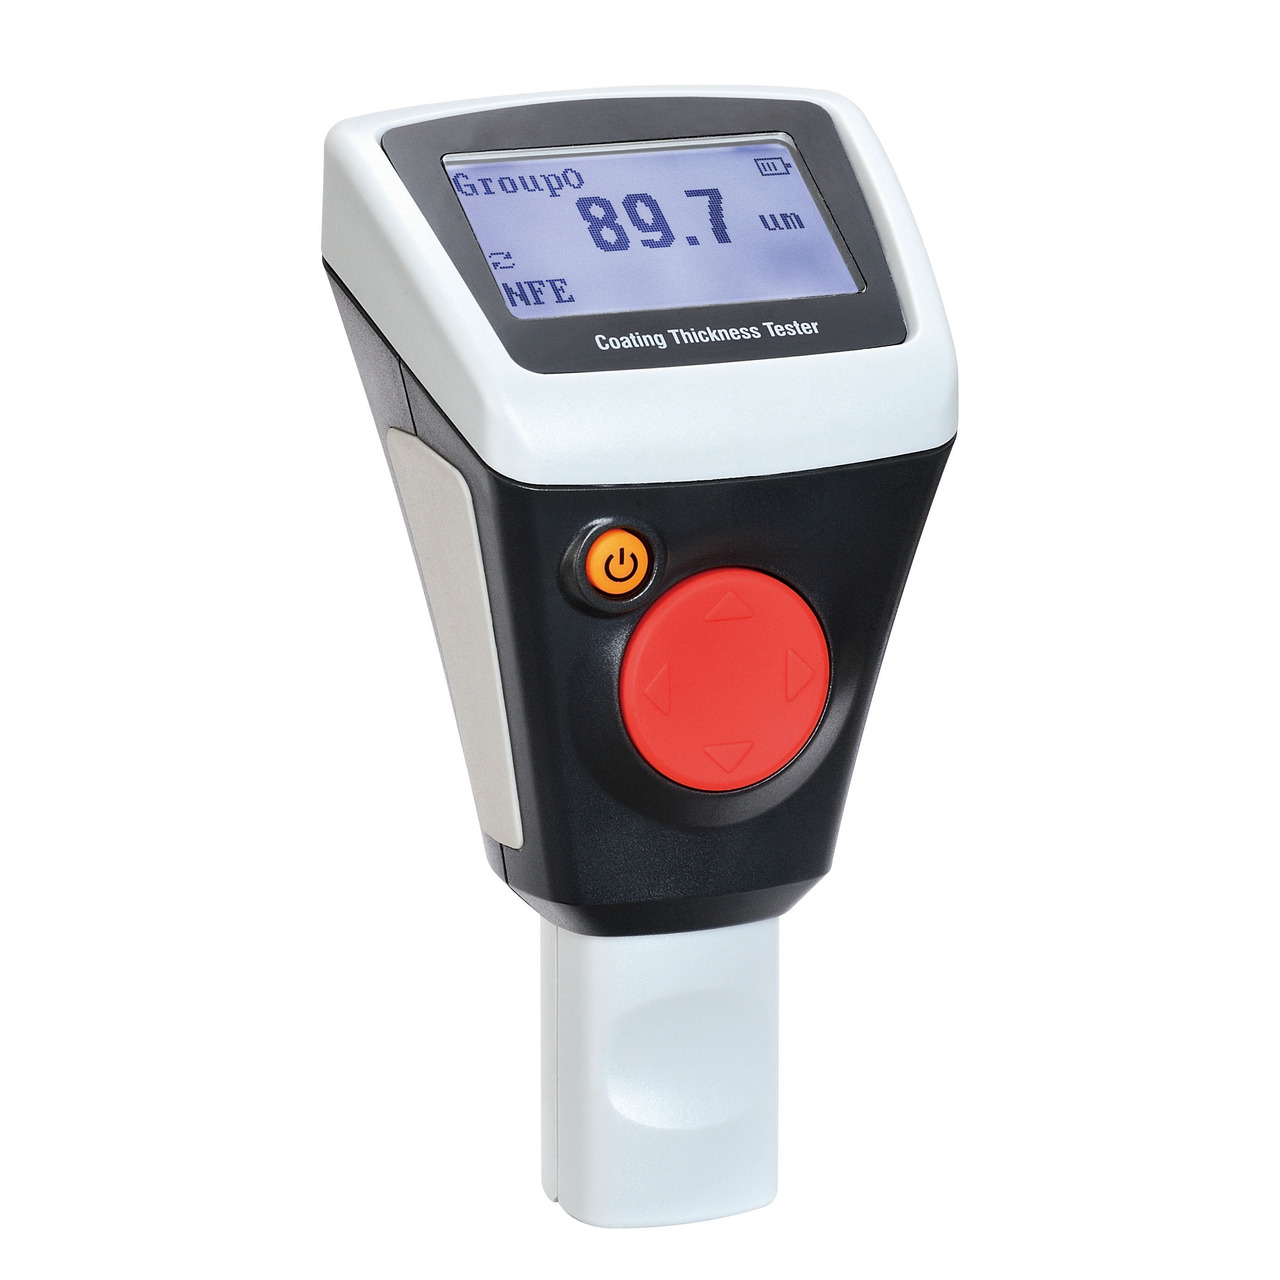 CEM Schichtdickenmessgerät DT-157 Coating Thickness Tester